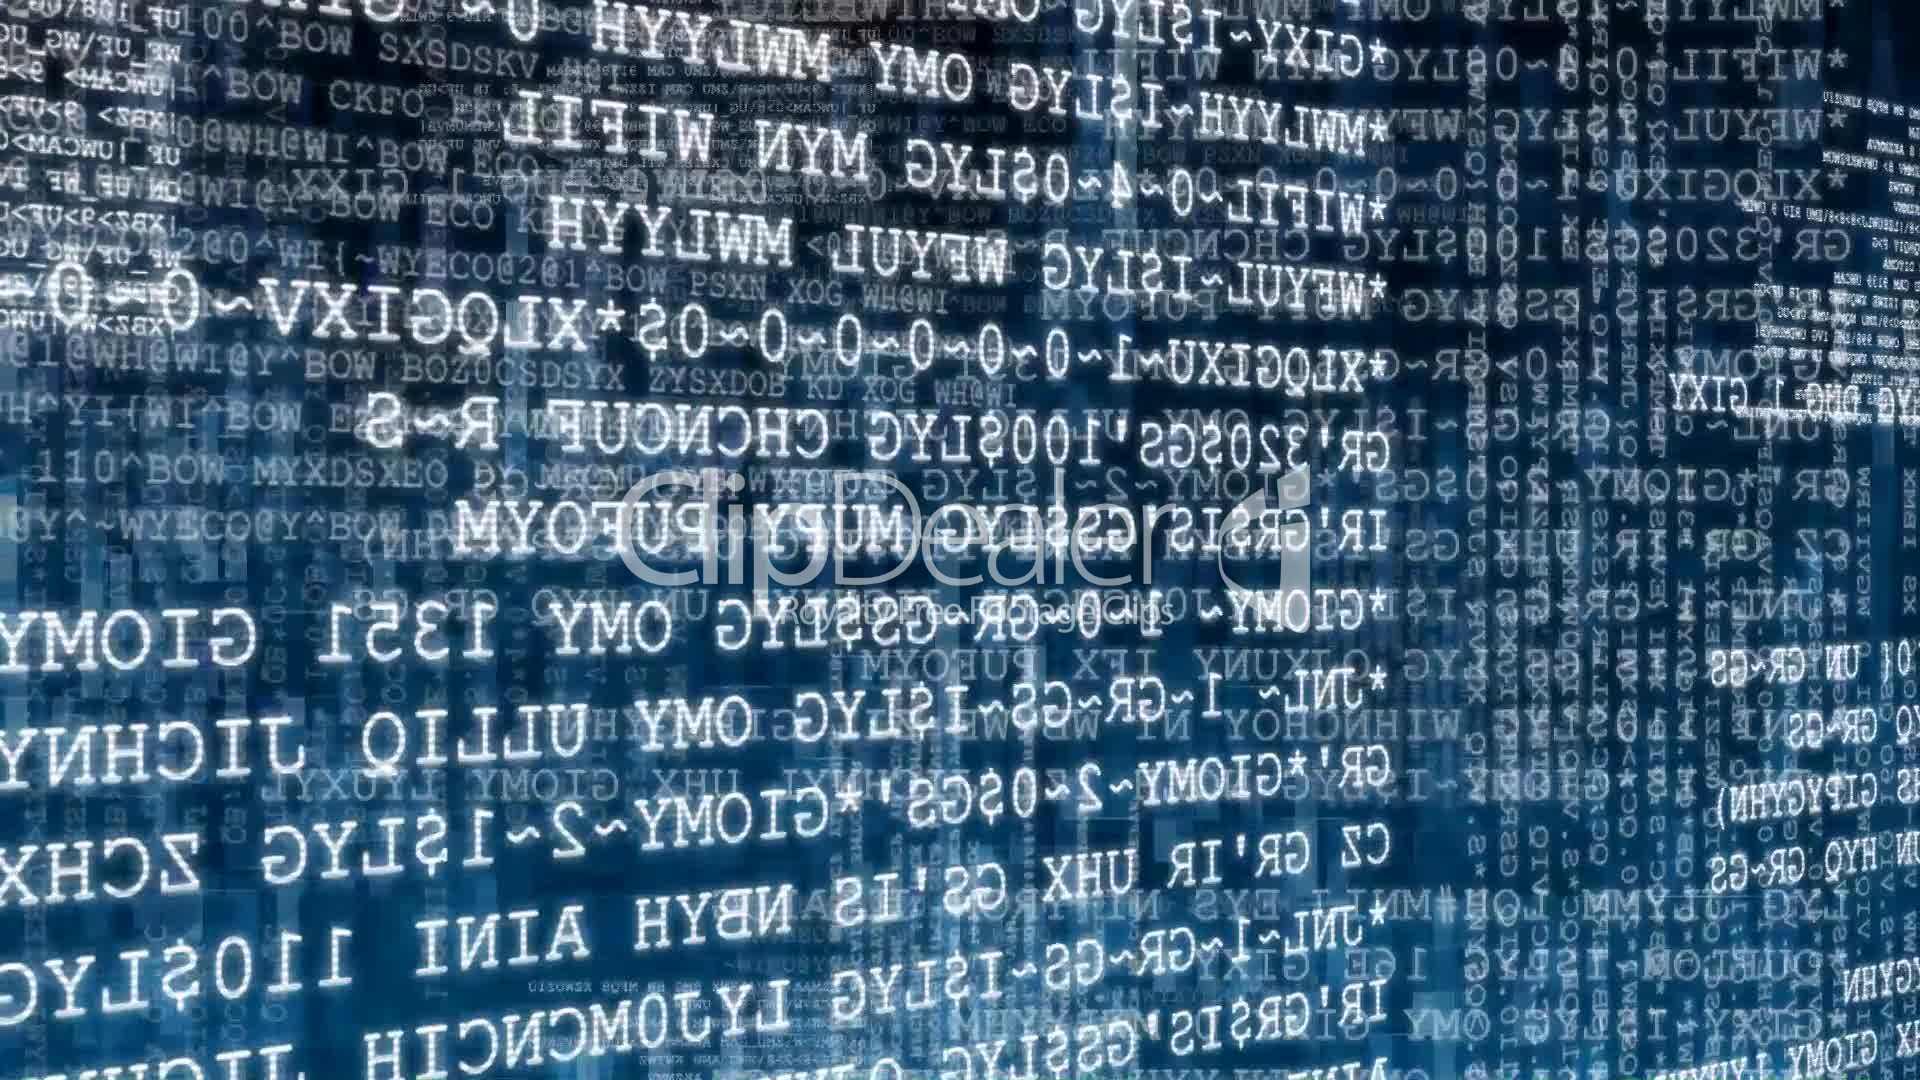 Computer Science Code Wallpaper Image source declipdealer 1920x1080